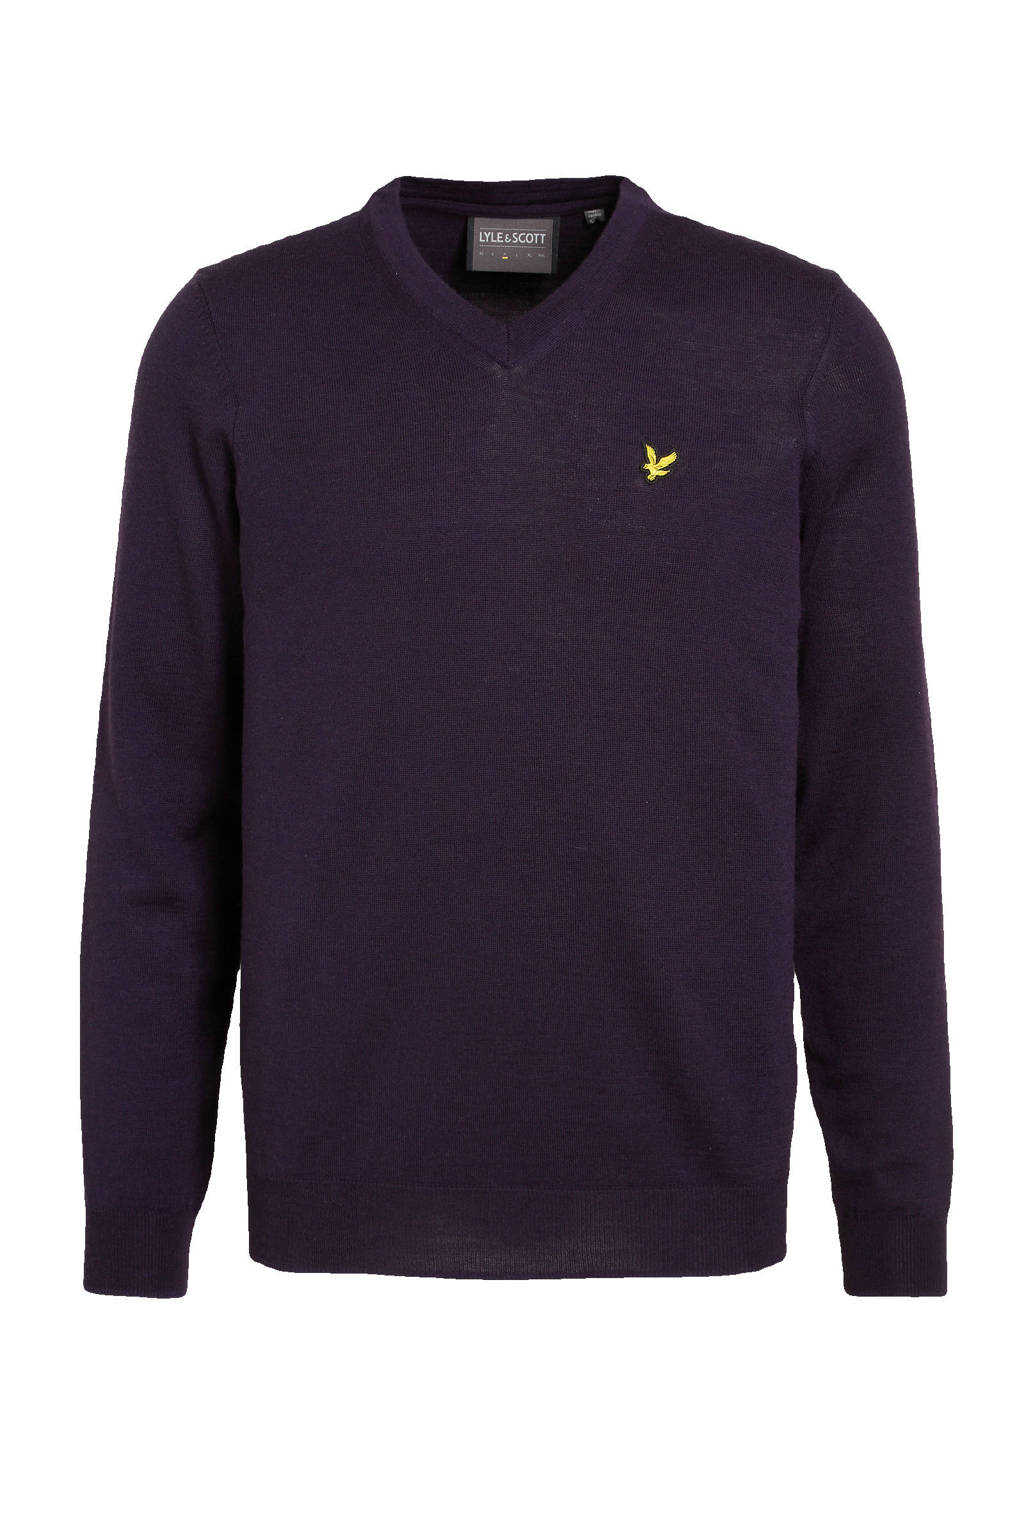 Lyle & Scott sweater donkerpaars, Donkerpaars